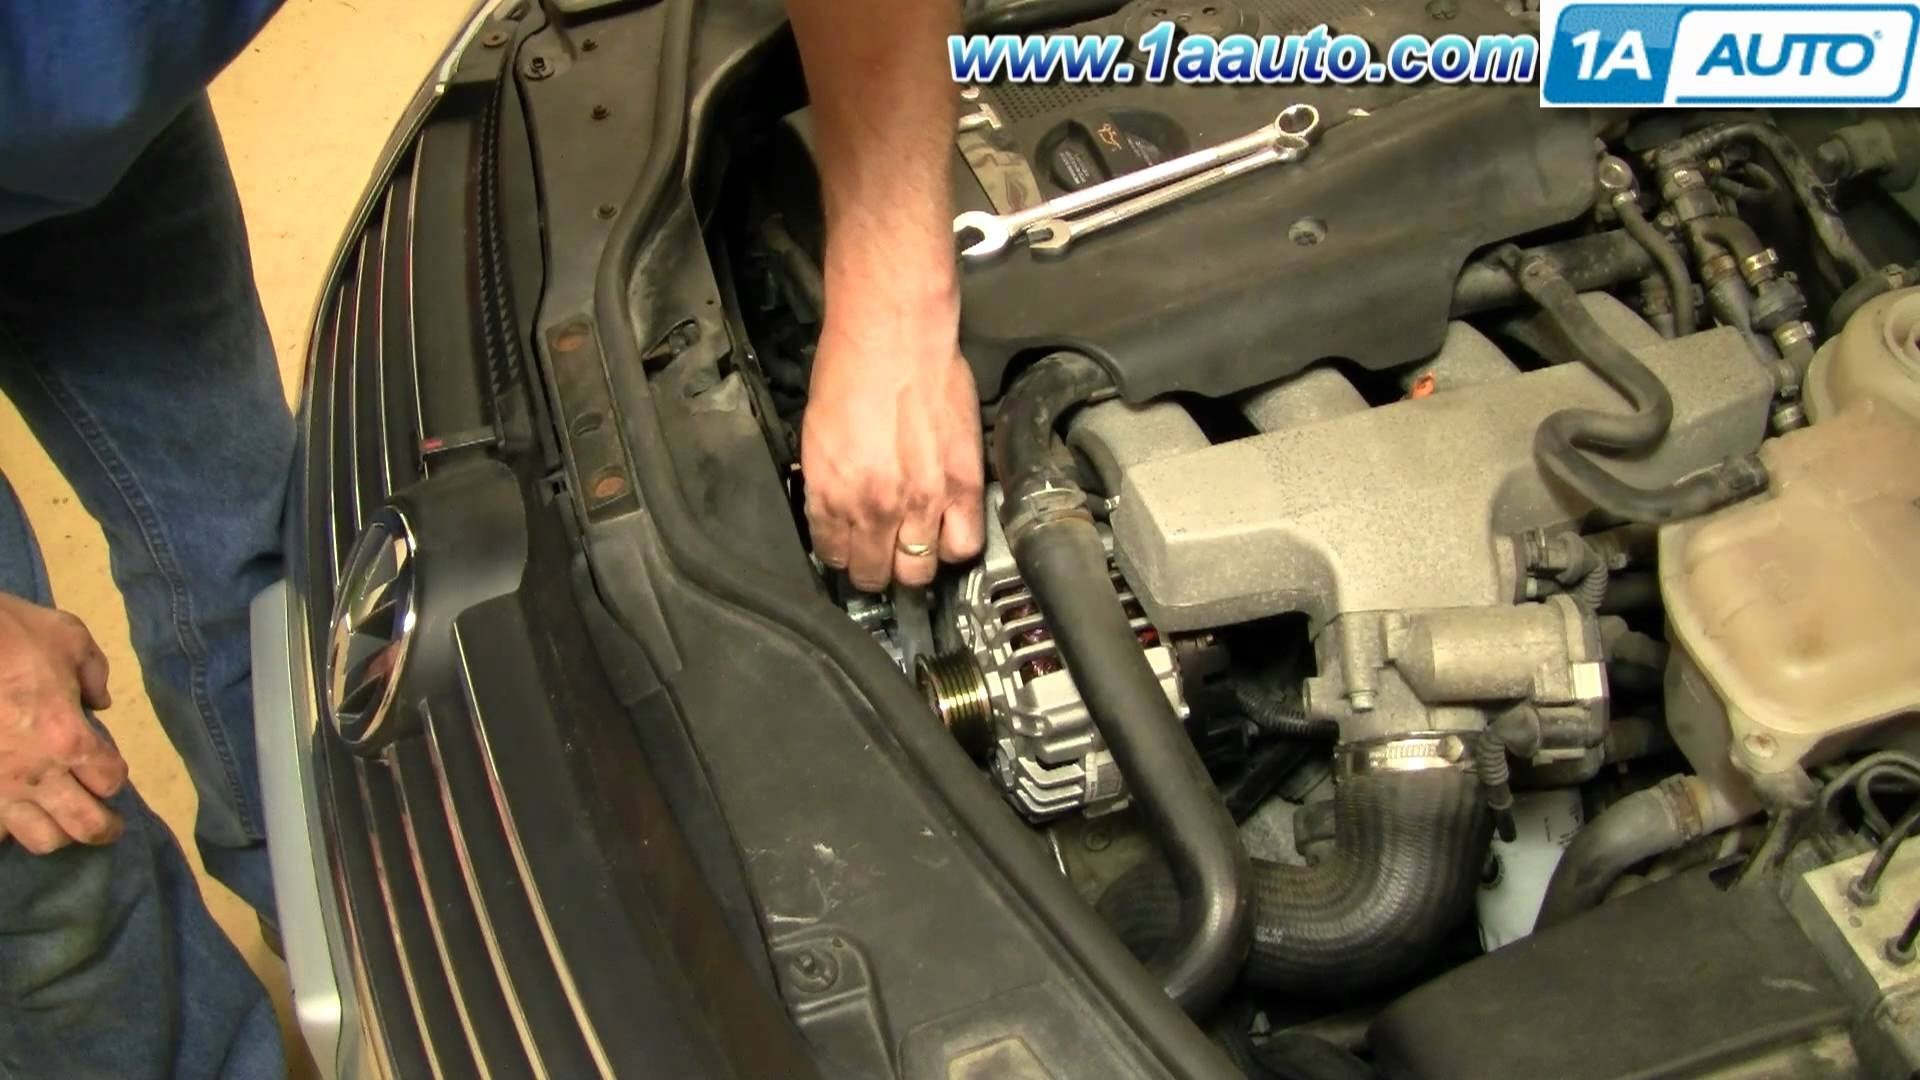 1999 Vw Passat Engine Diagram How to Install Replace Engine Serpentine Belt Tensioner Volkswagen Of 1999 Vw Passat Engine Diagram